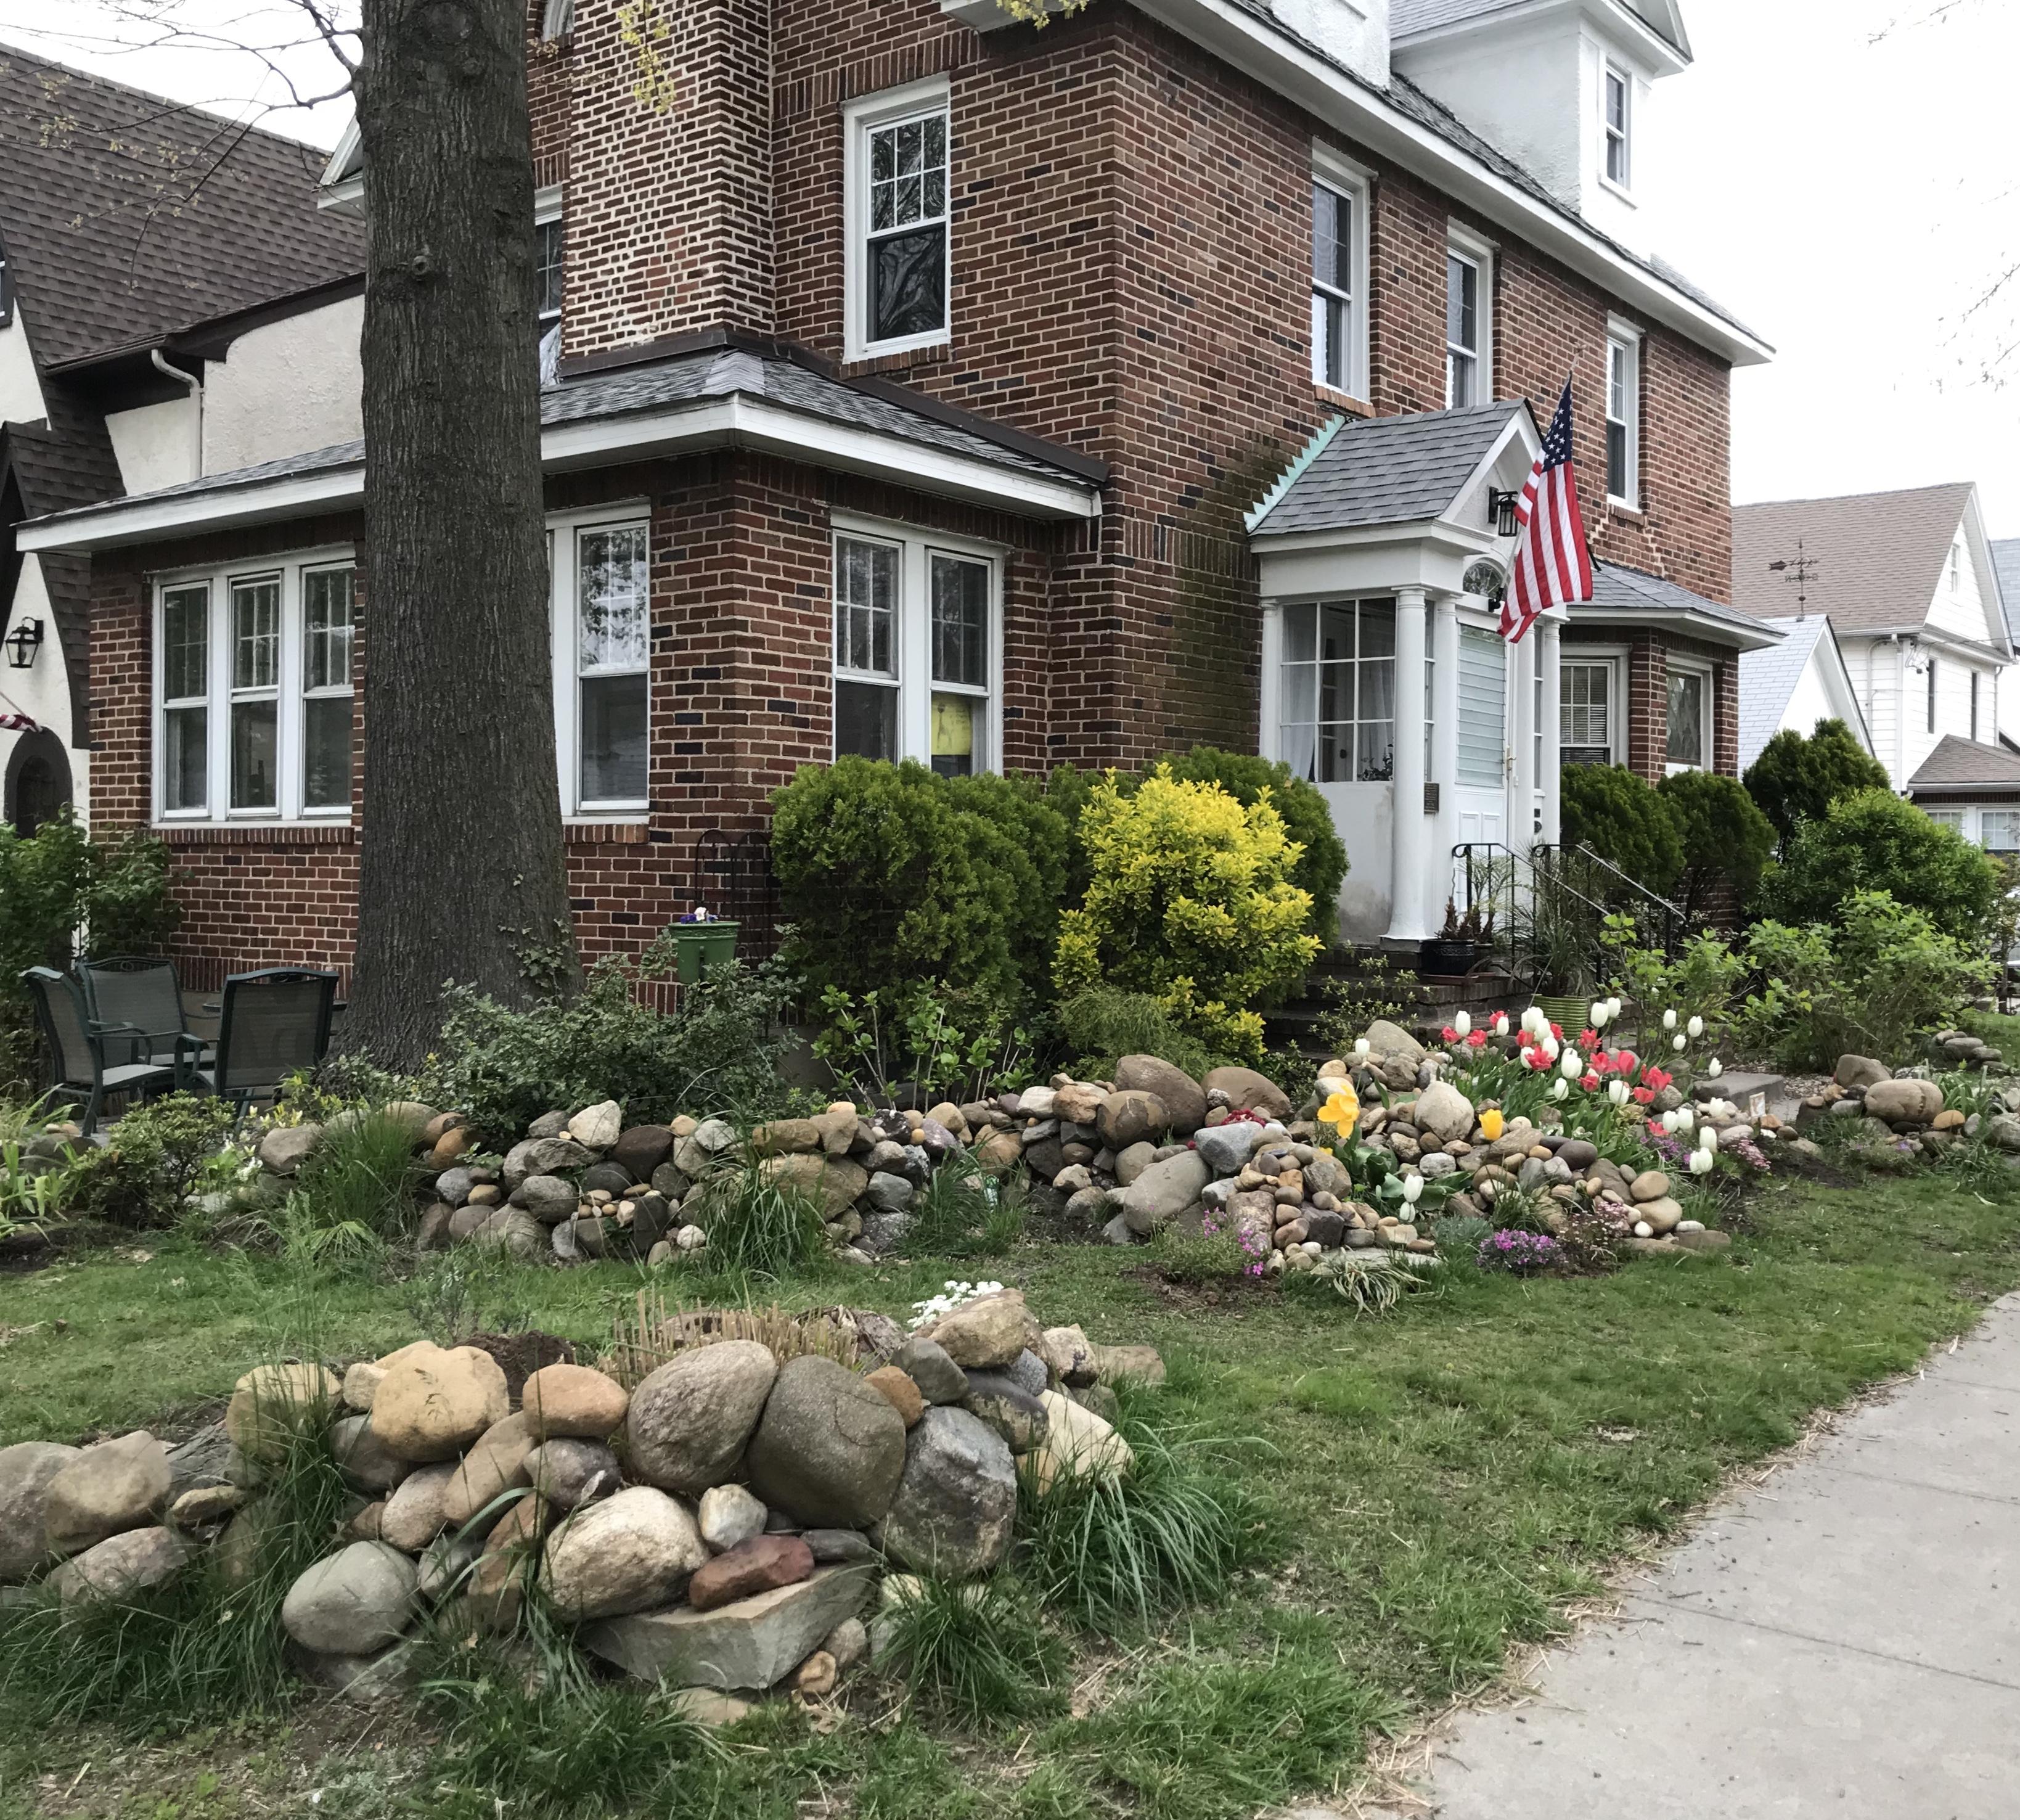 29-58 169th Street - White Residence